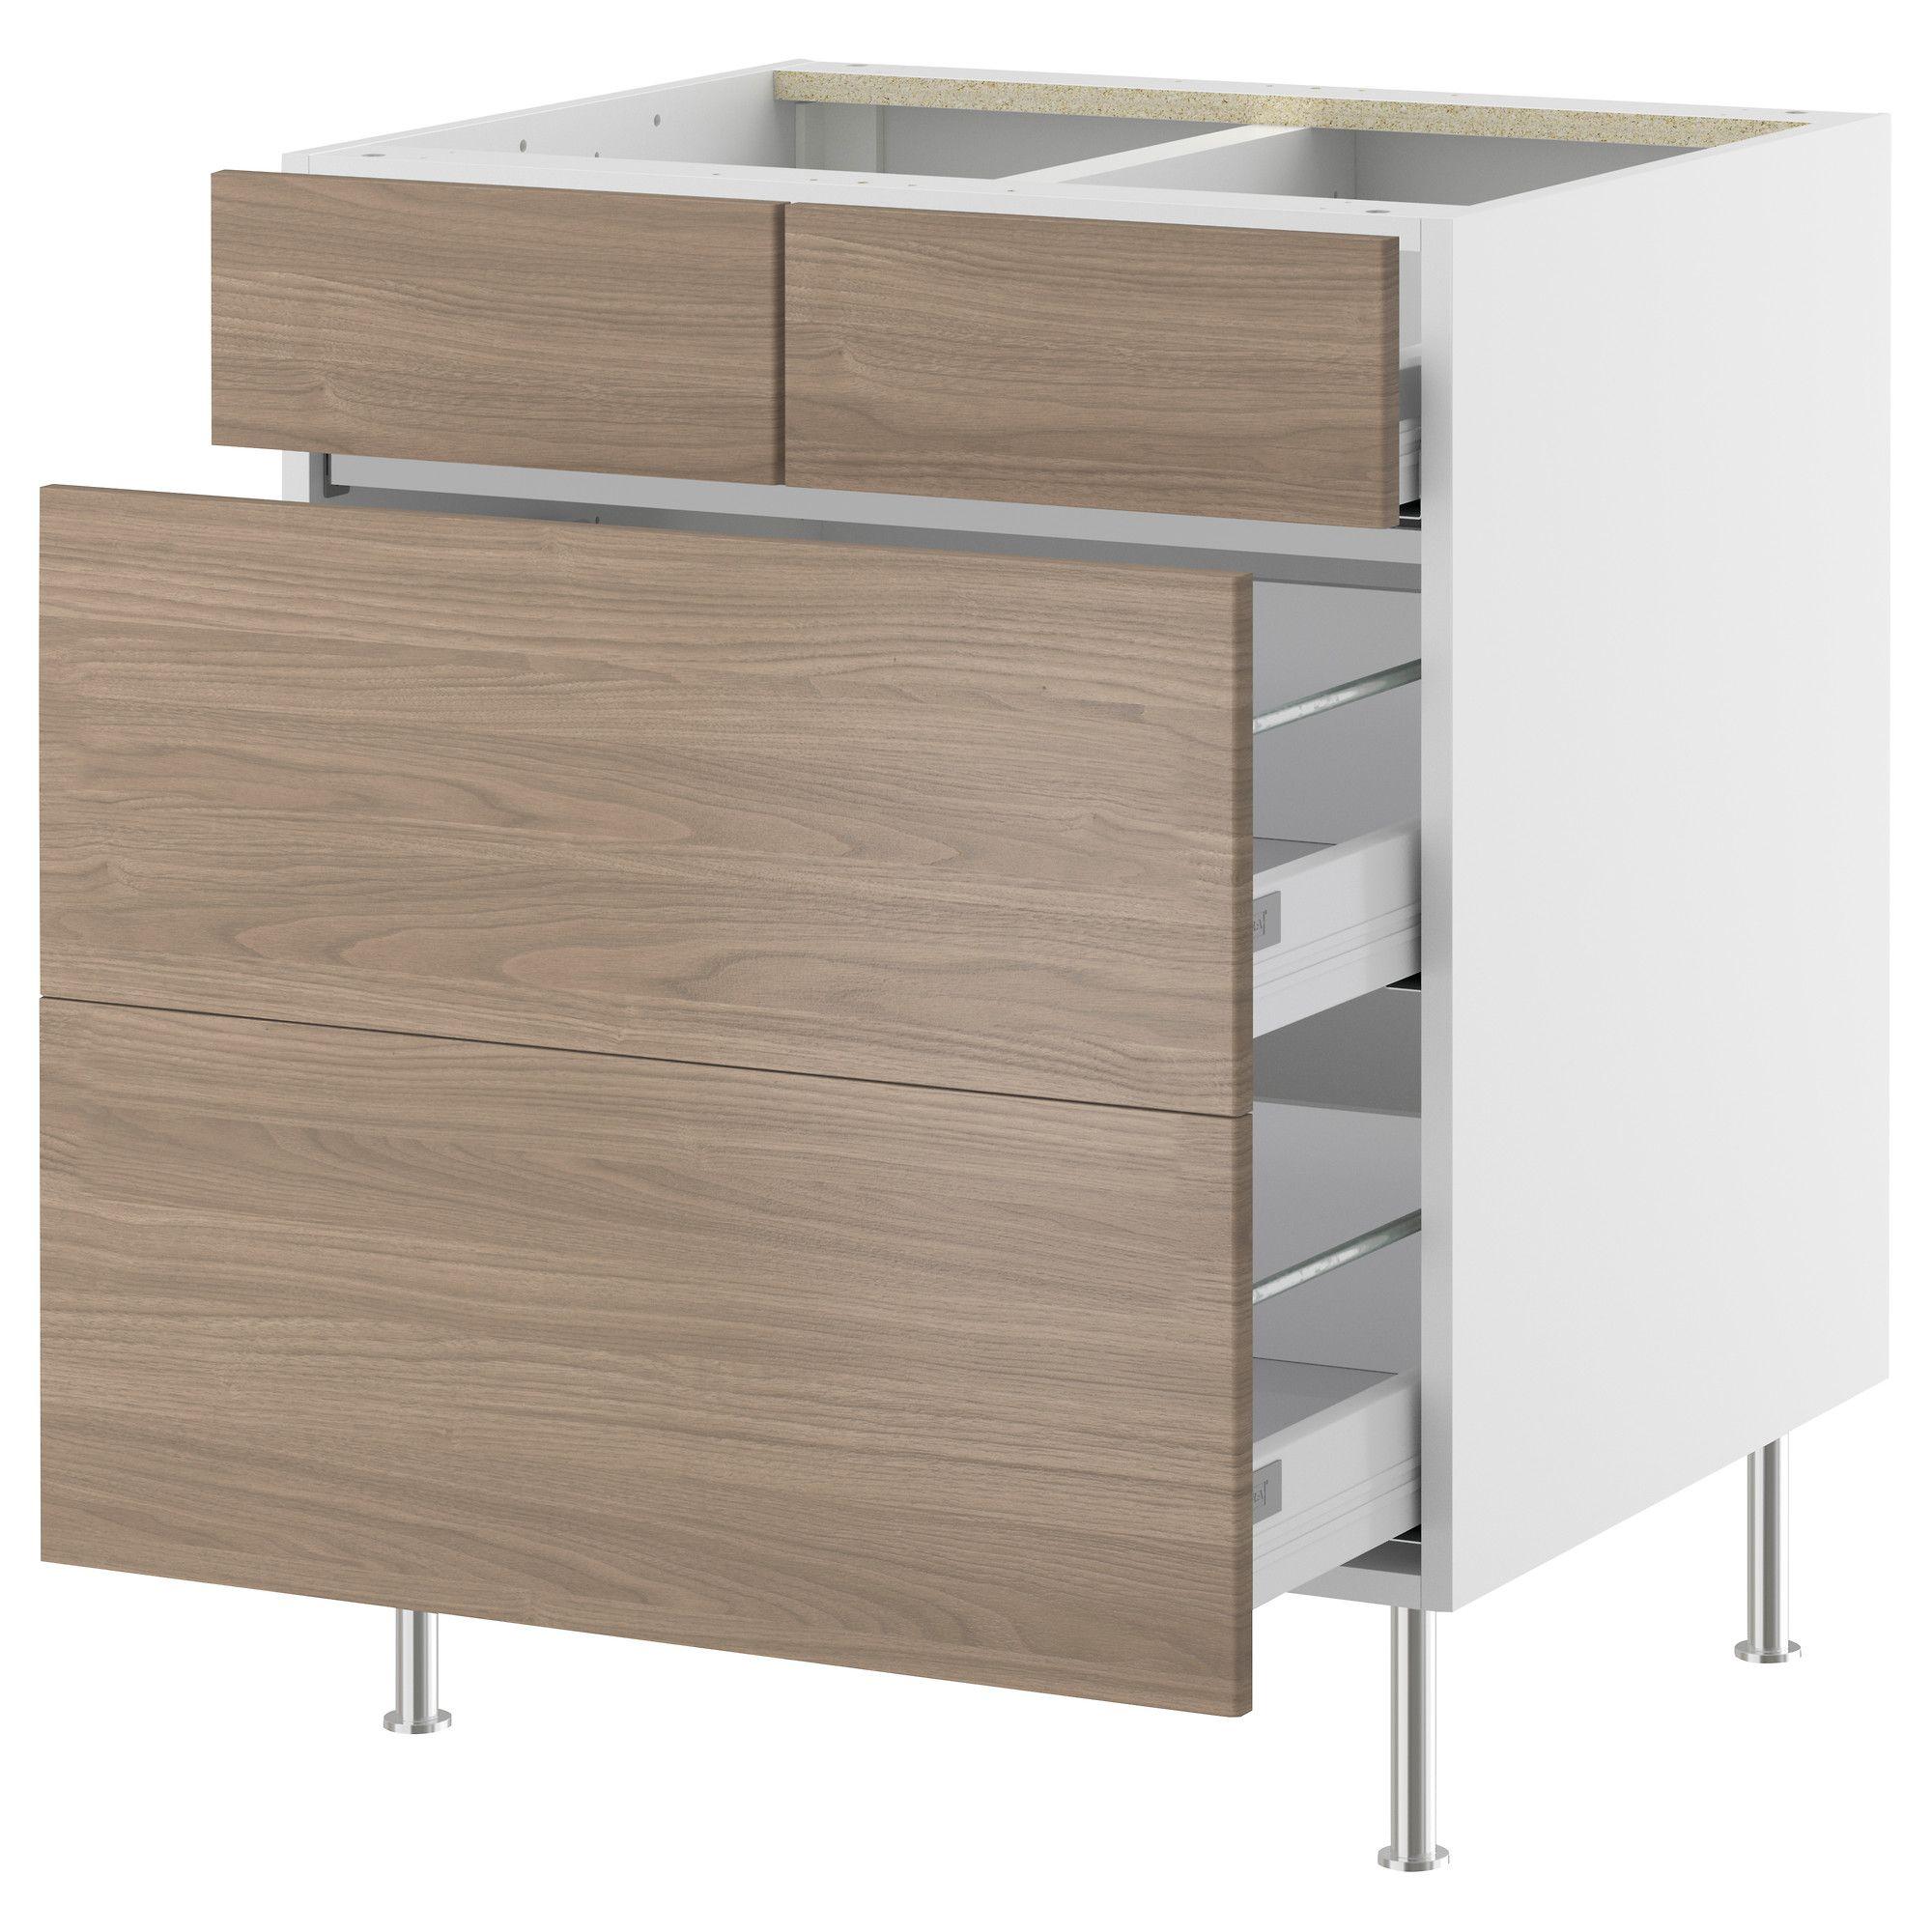 Interior Akurum Base Cabinet akurum base cabinet with 22 drawers birch effect sofielund walnut light